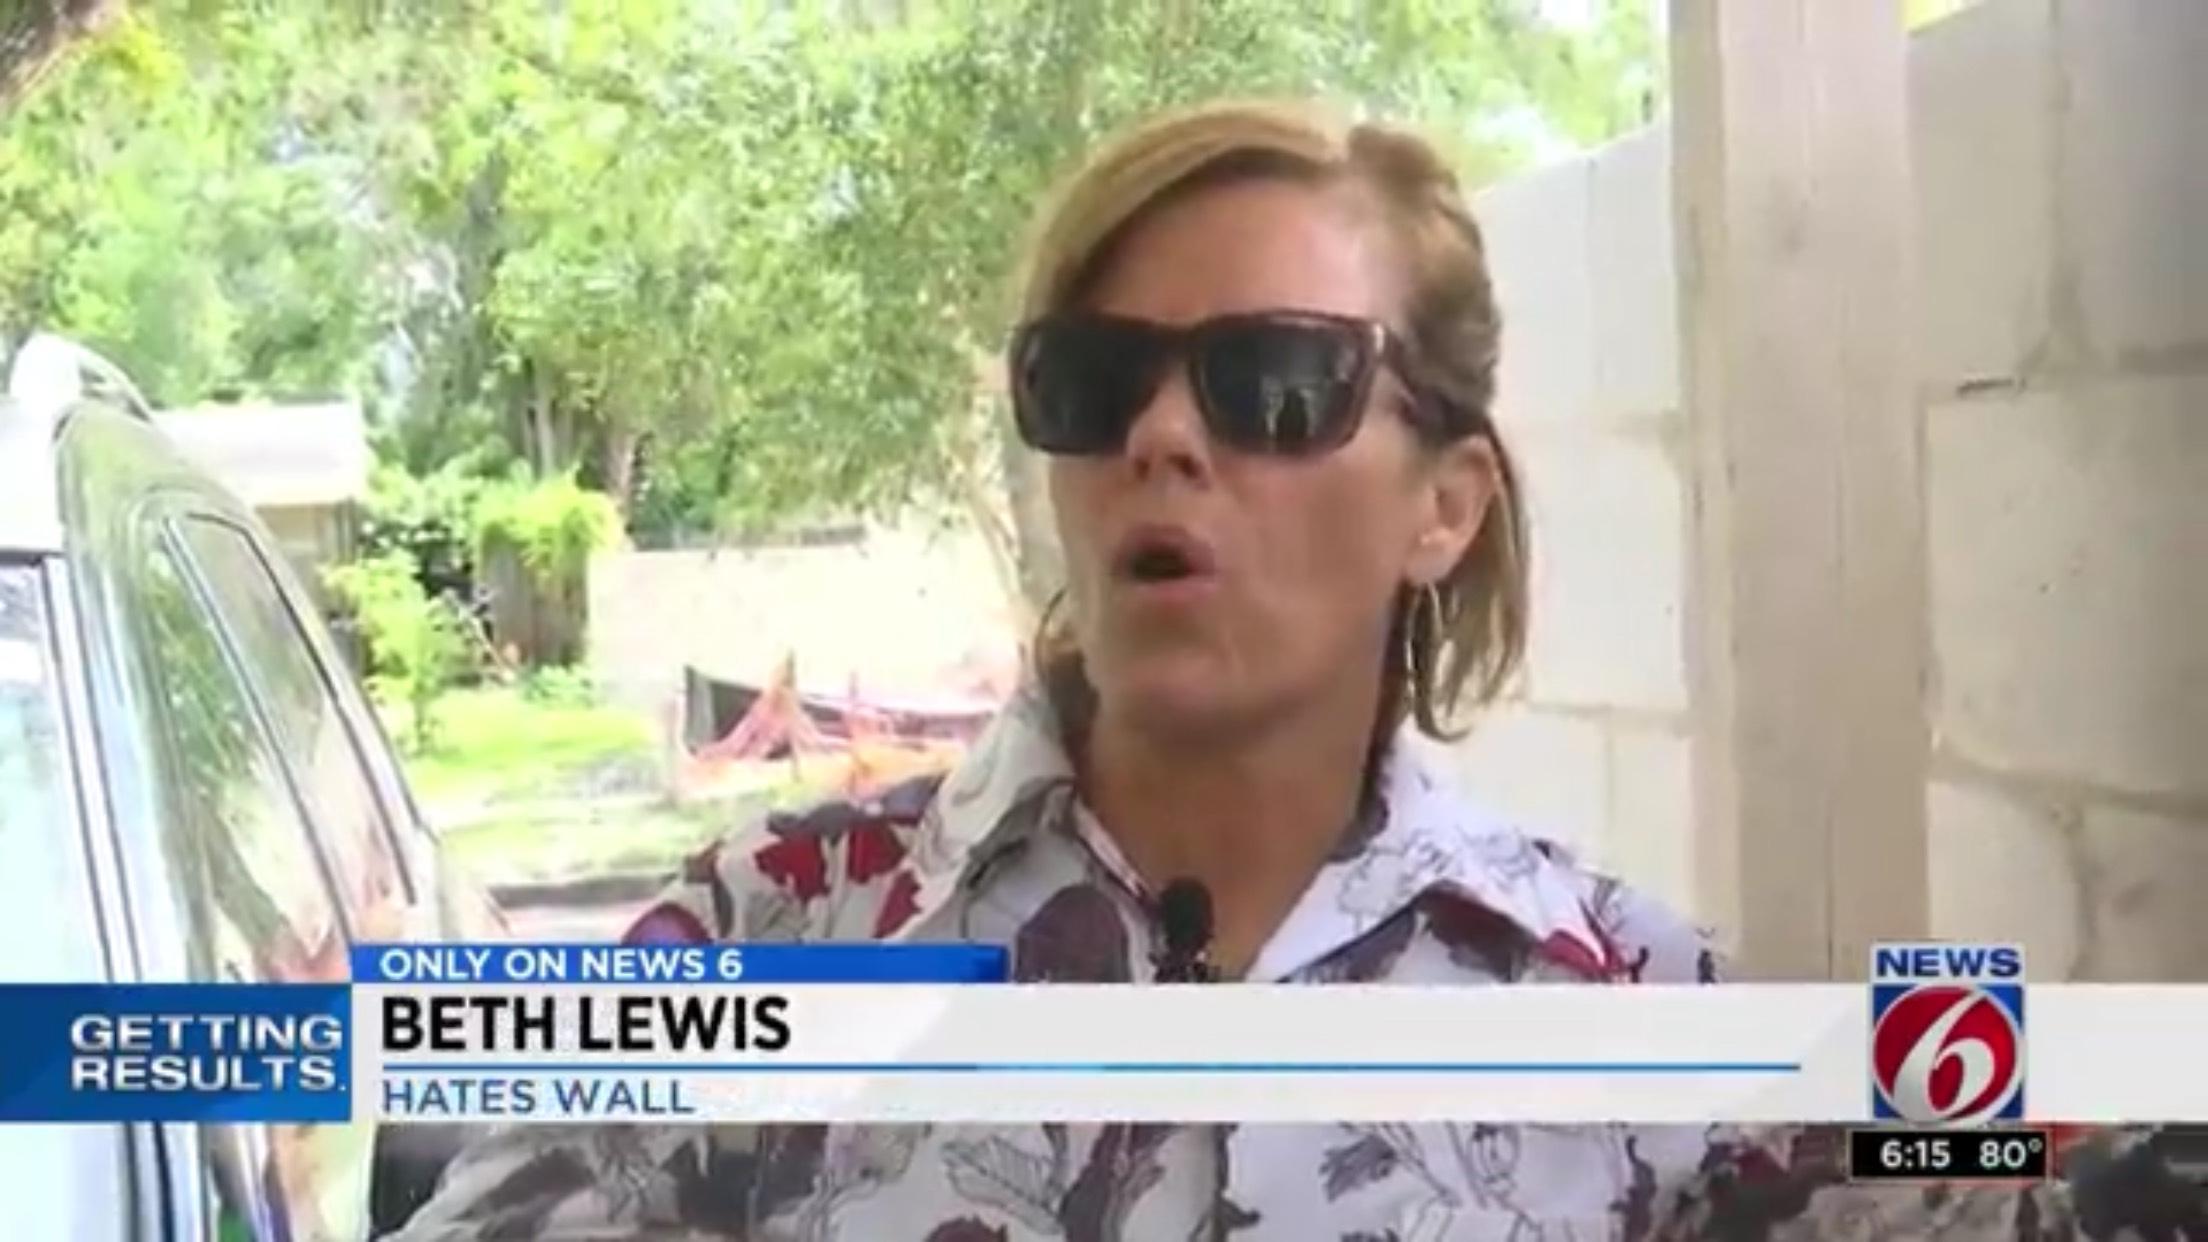 Beth Lewis: Hates Wall